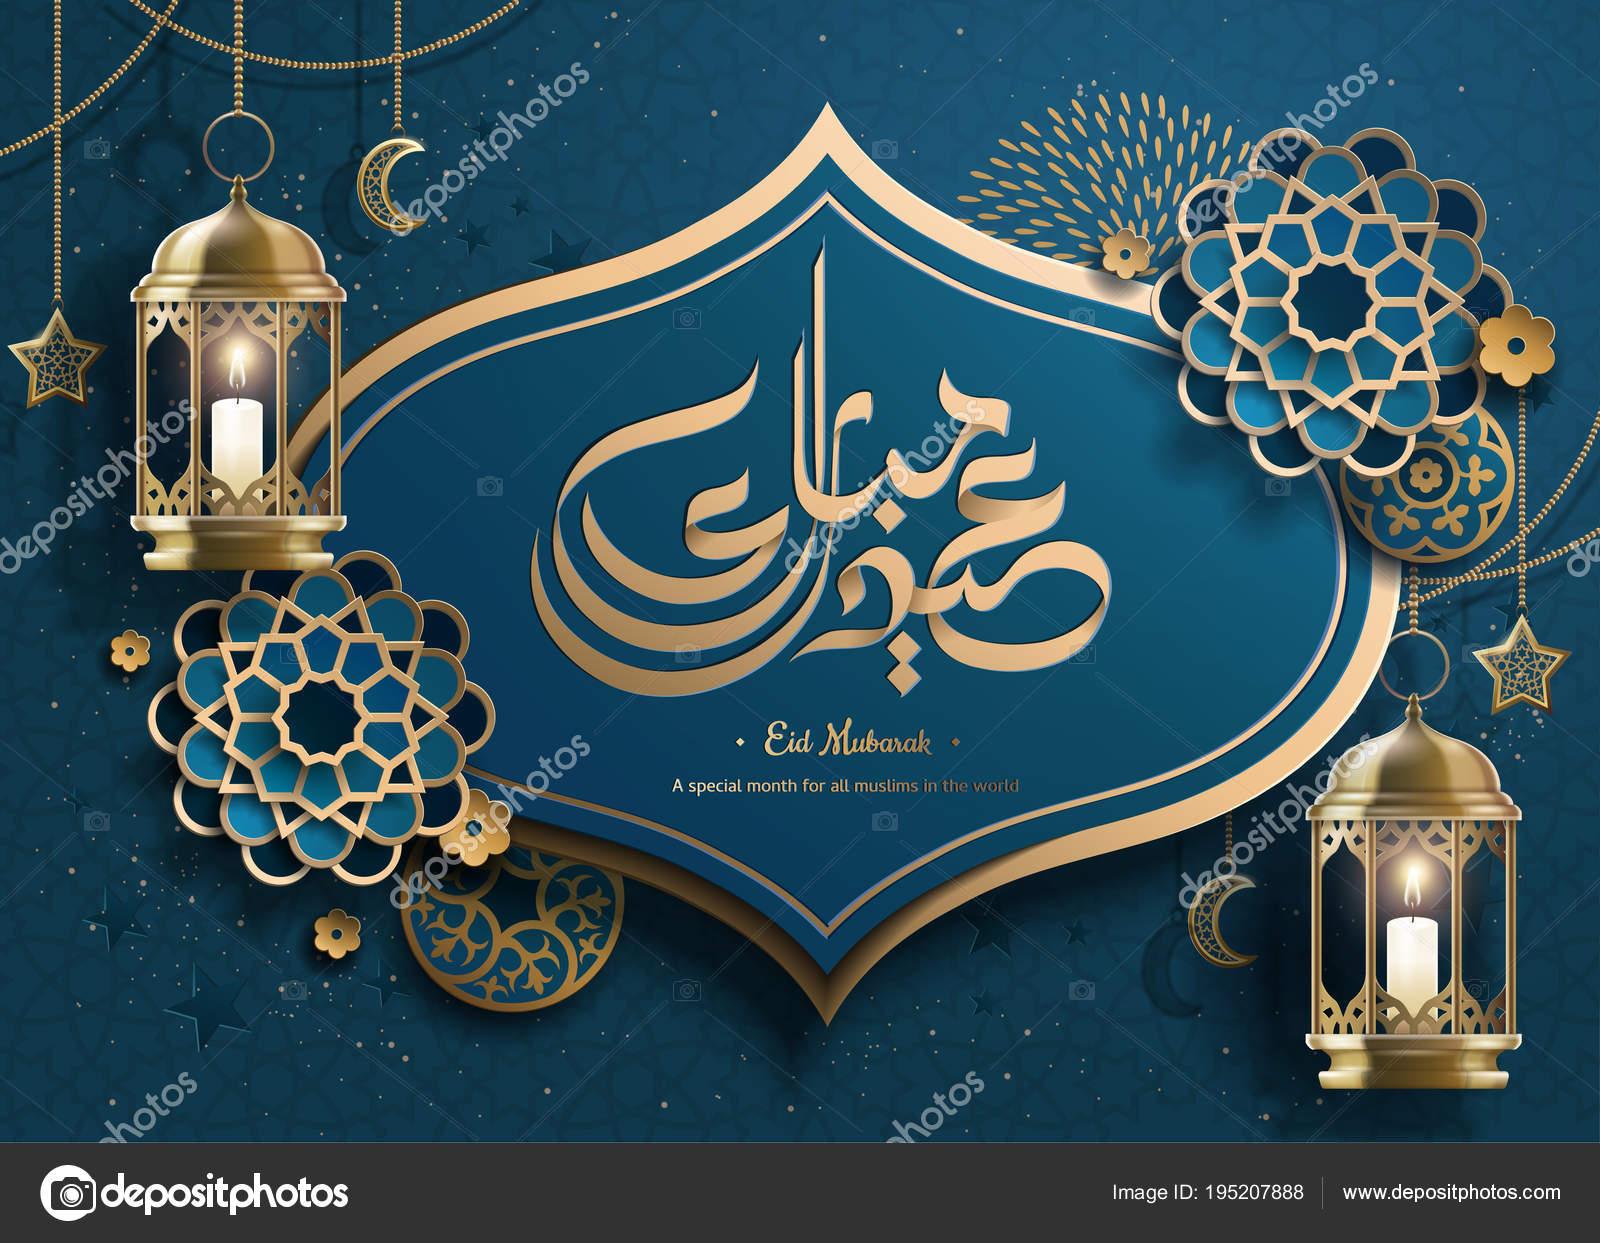 Eid mubarak calligraphy design u2014 stock vector © kchungtw #195207888